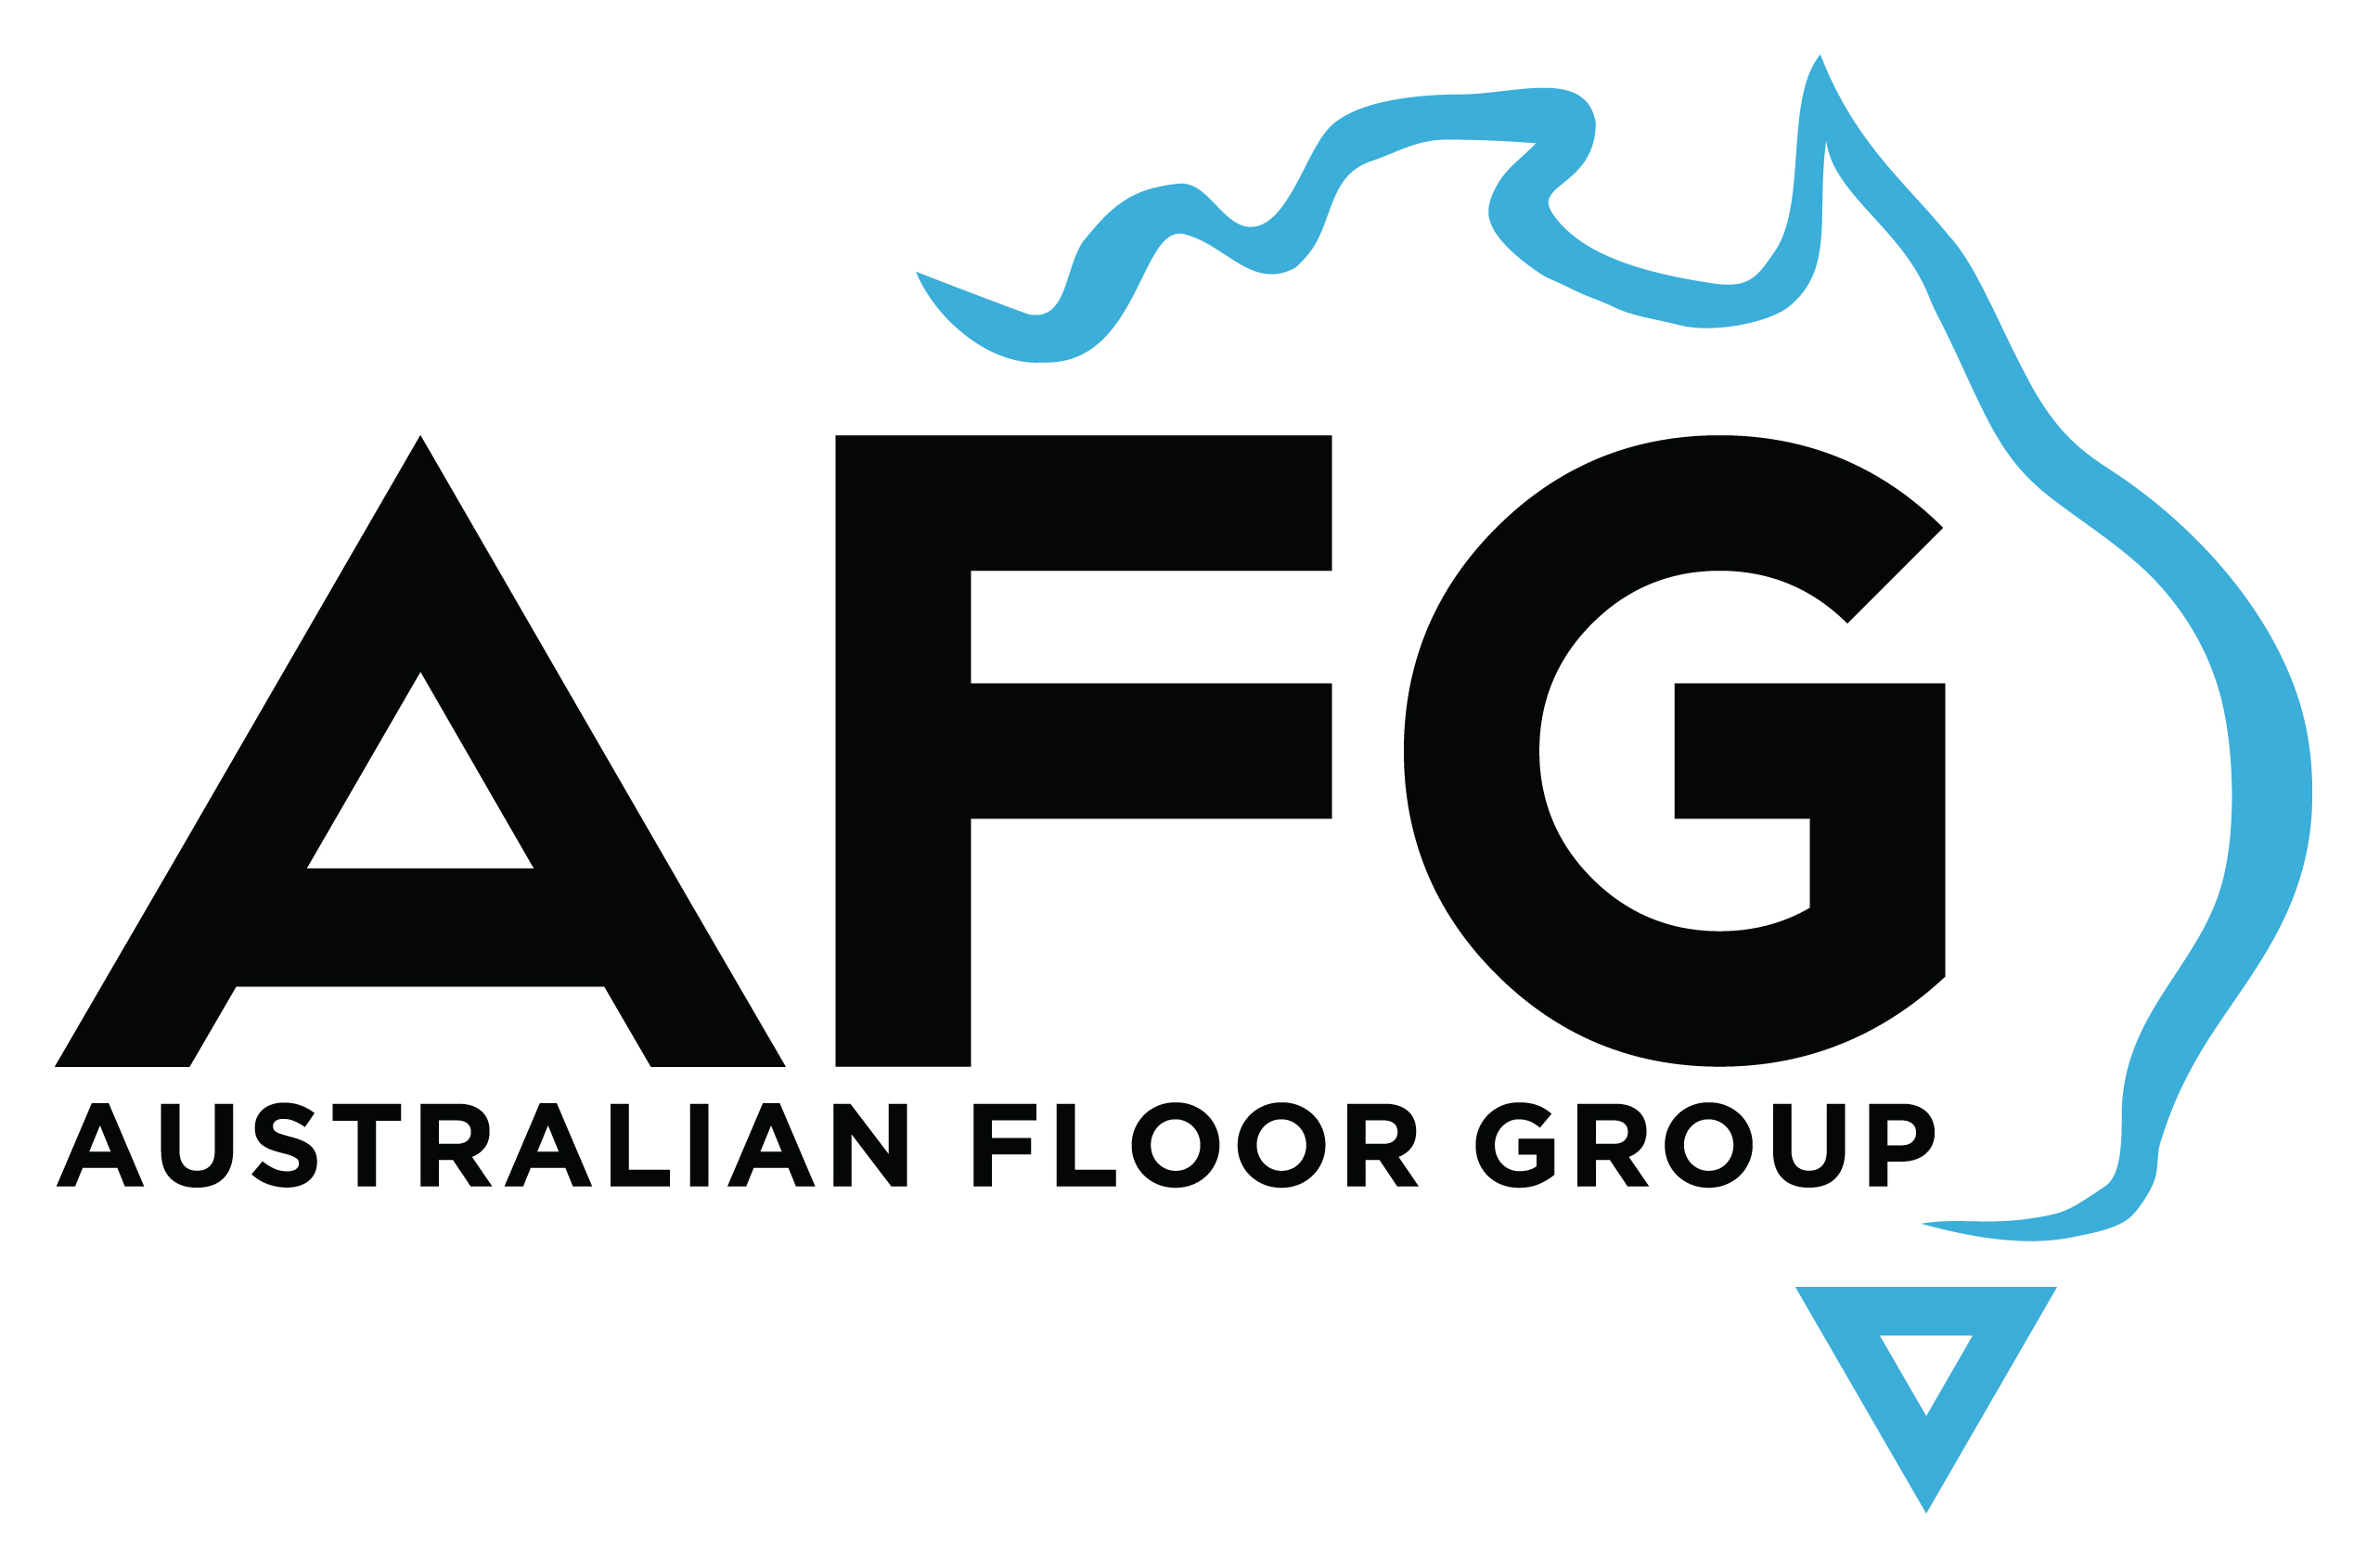 Australian Floor Group